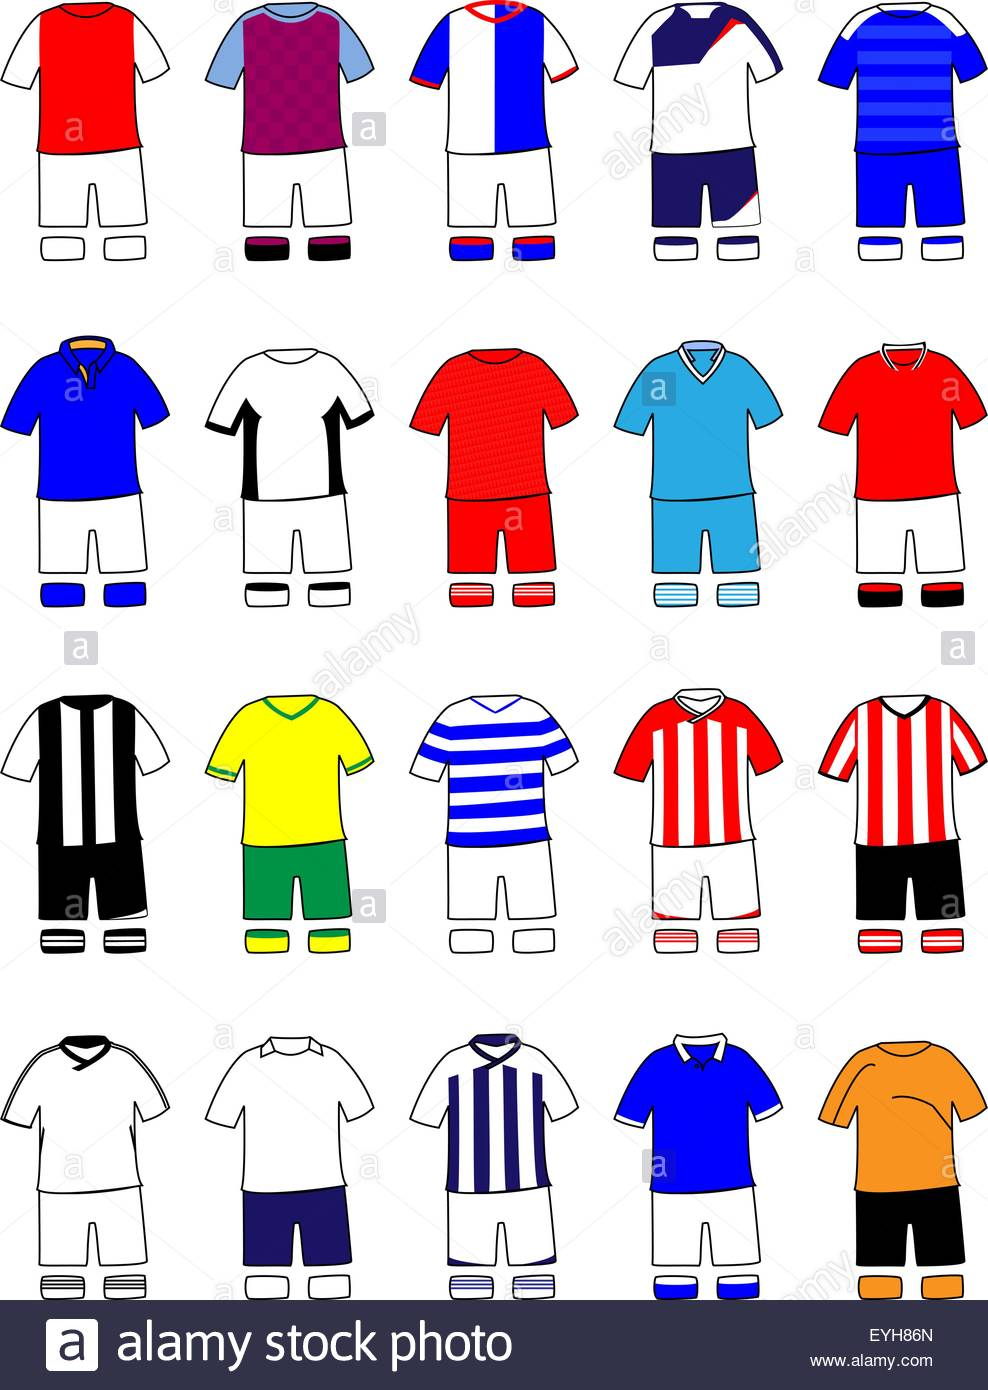 English League Kits 2011/2012 - Stock Vector